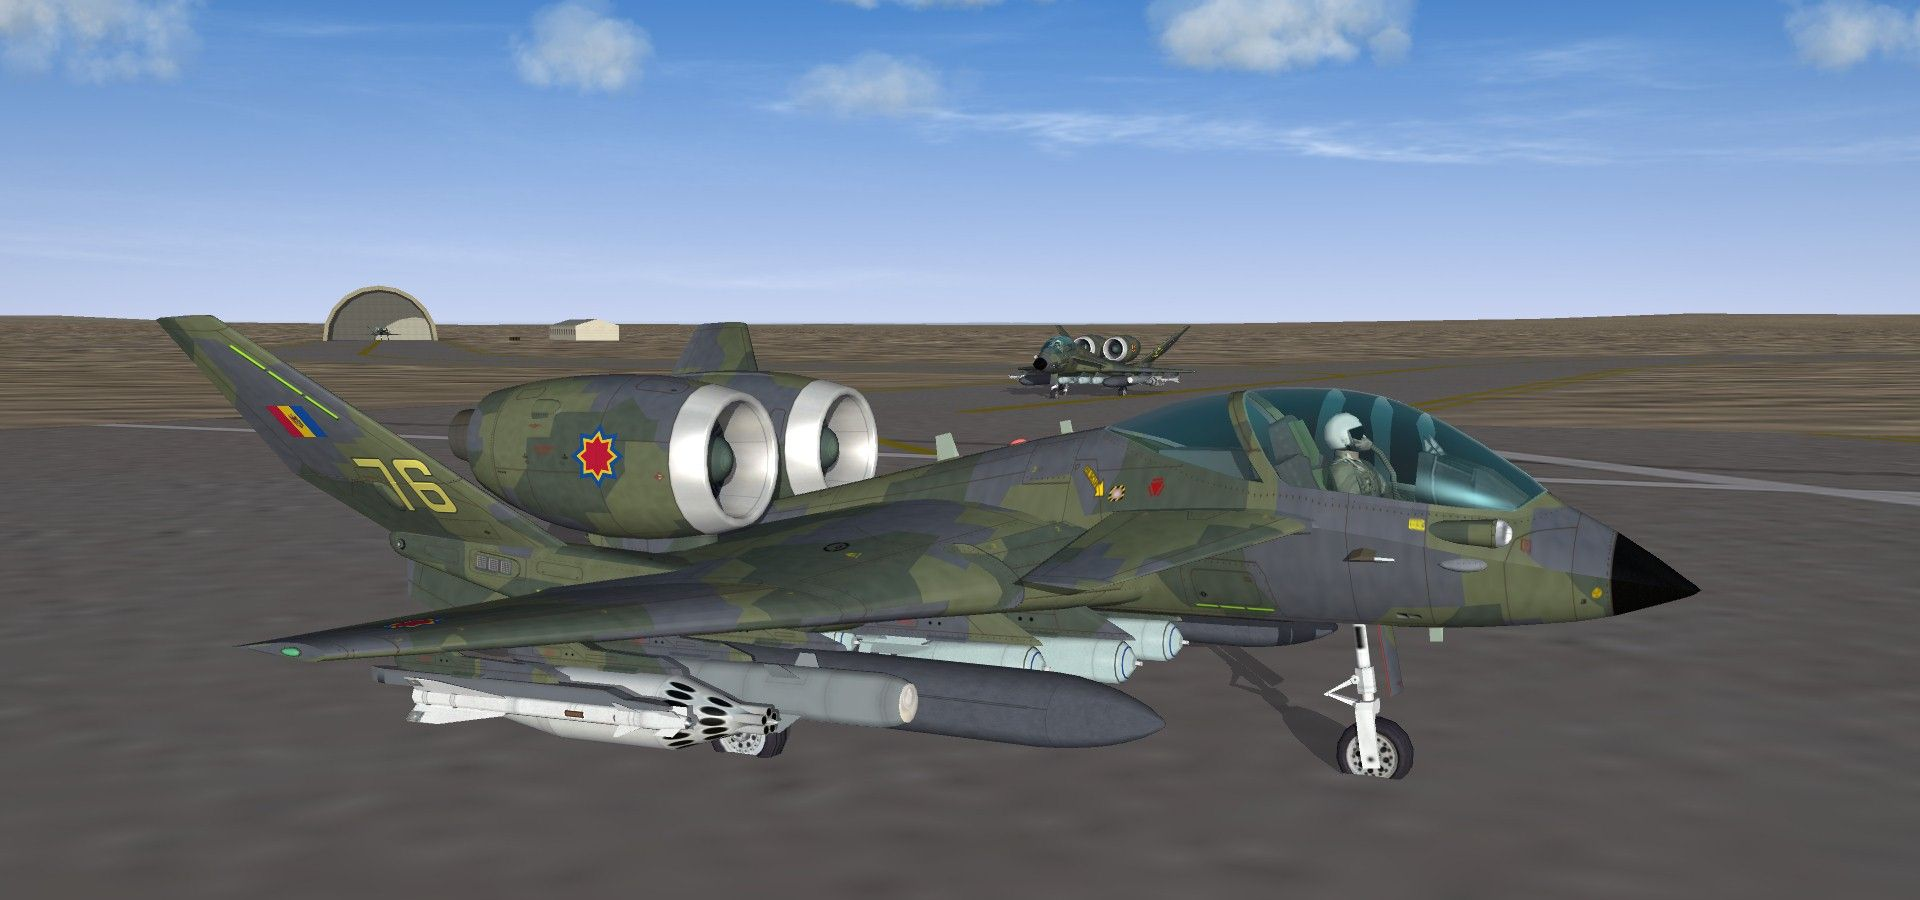 MOLDOVAPZL-230FSKORPION02.jpg